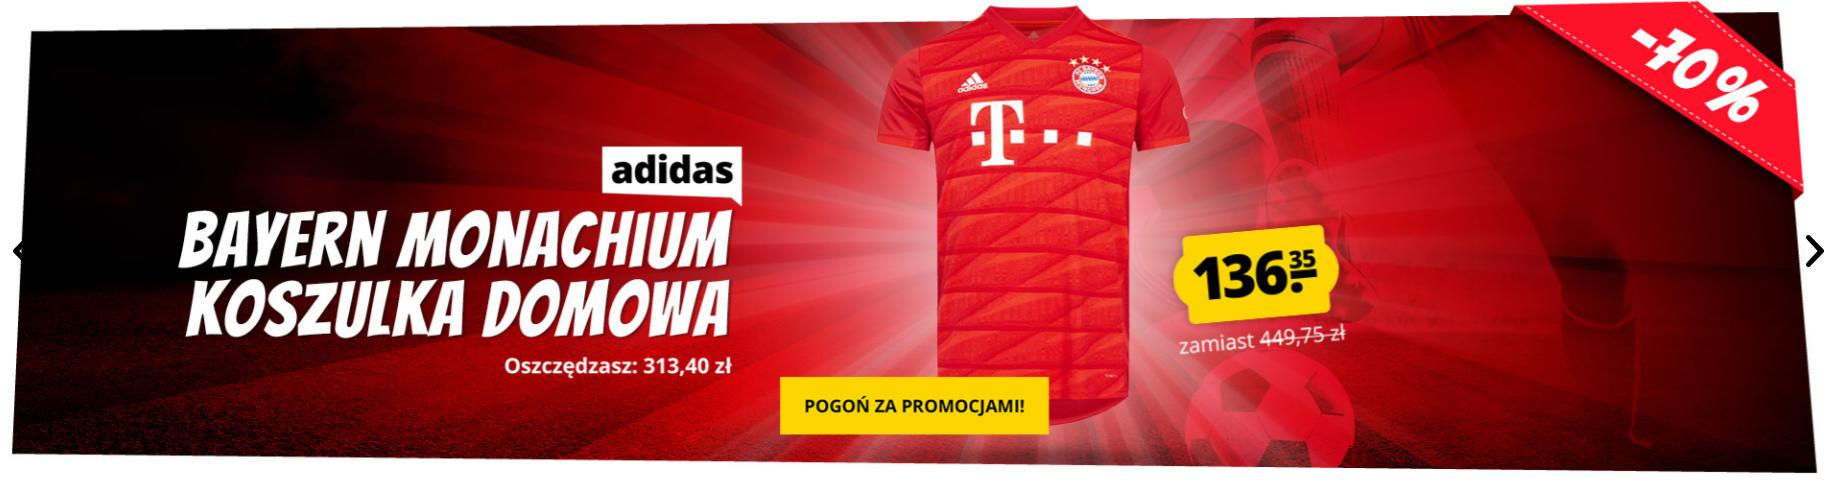 Sport Rabat: 70% rabatu na koszulkę domową Bayernu Monachium